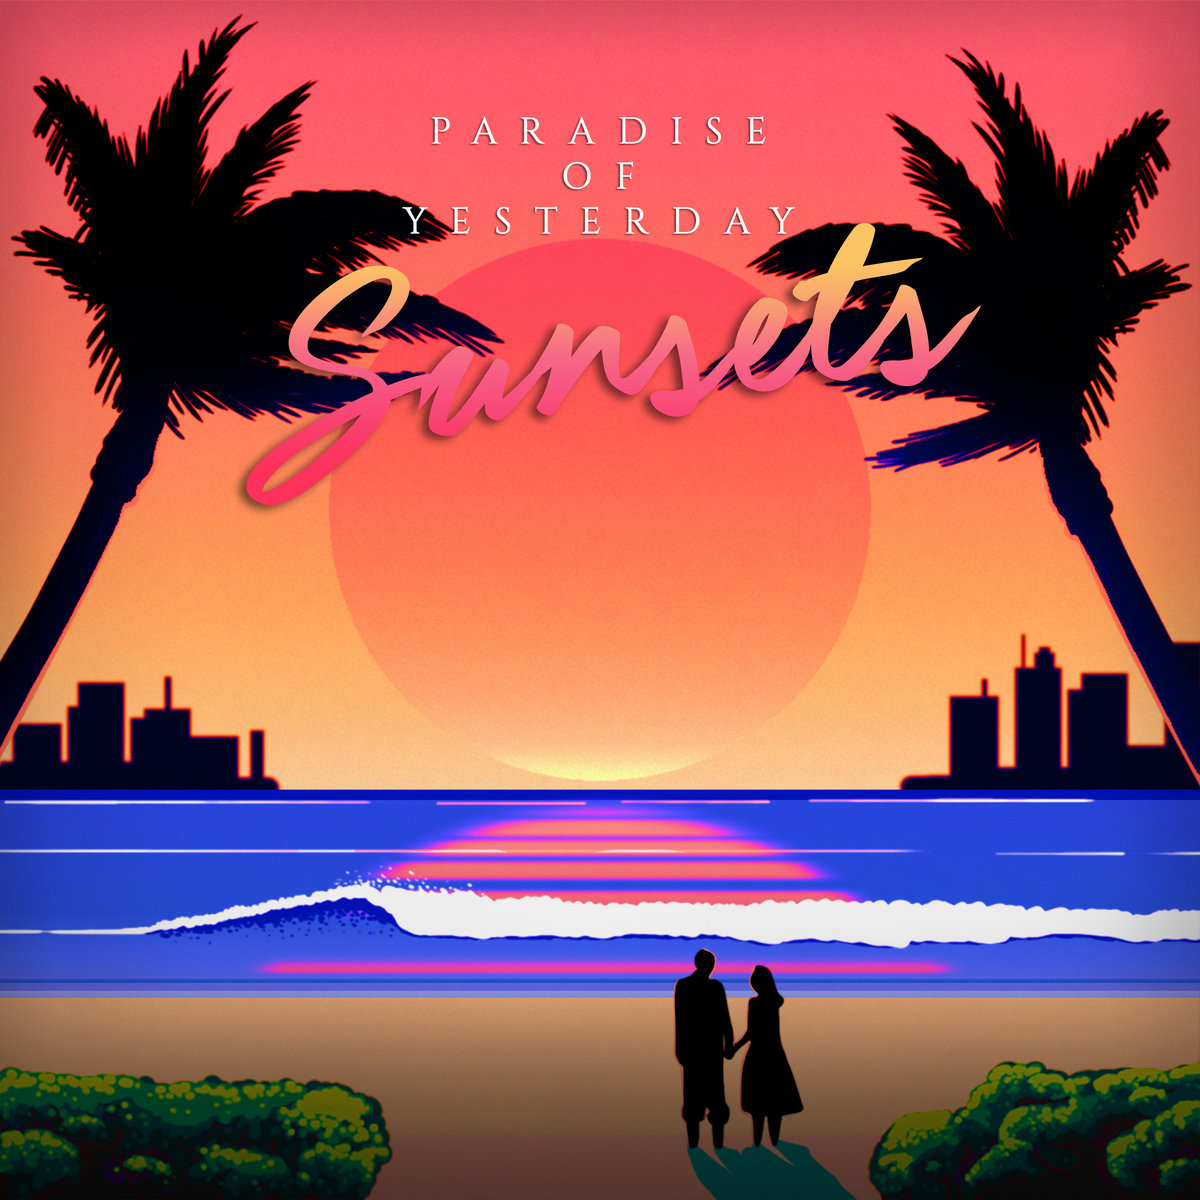 Paradise of Yesterday Sunsets 1